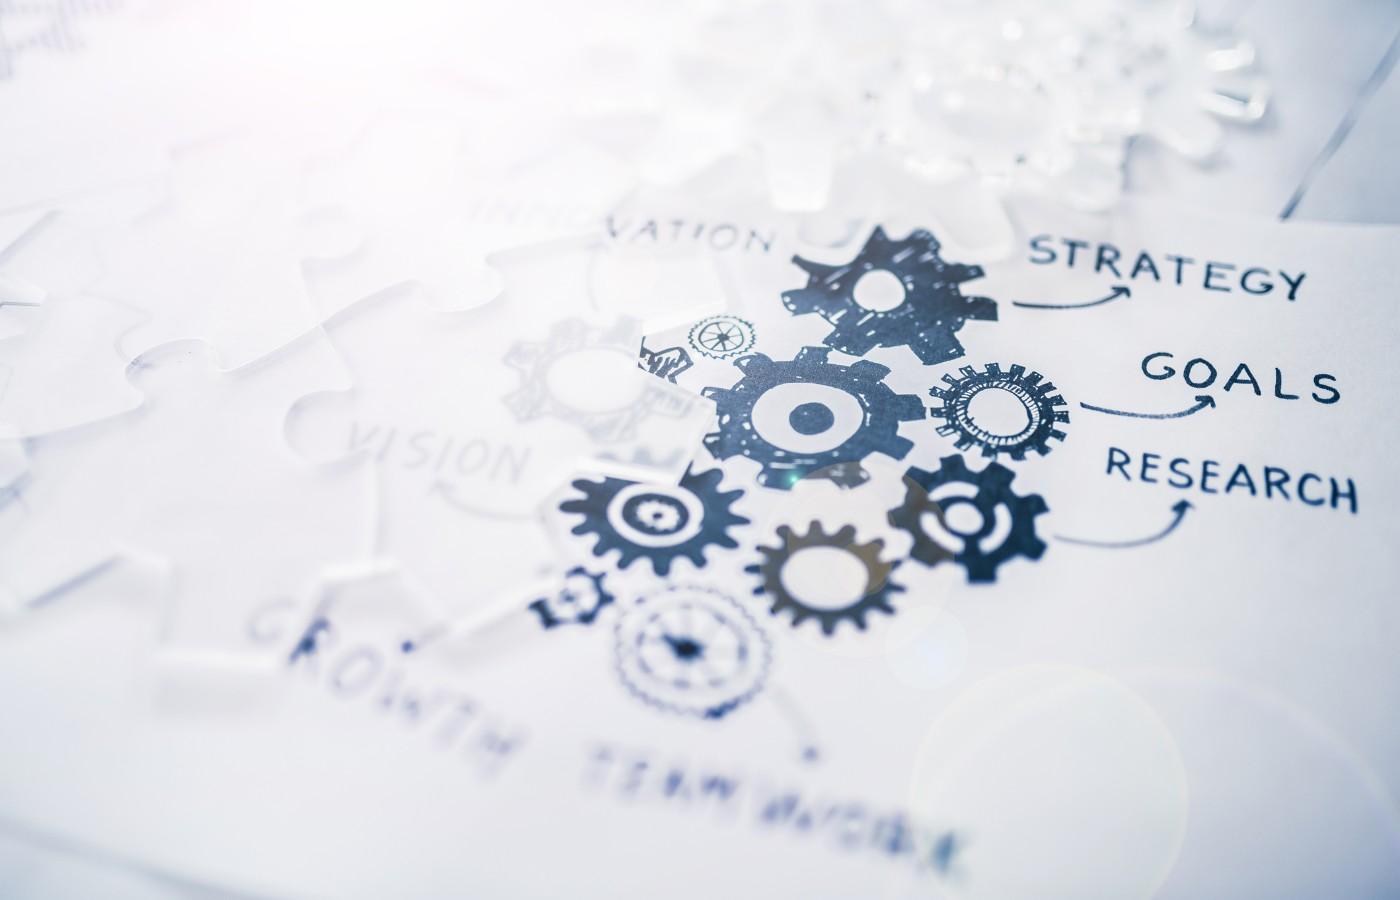 Hedef Kitle/Pazar Analizi & Strateji Planlama